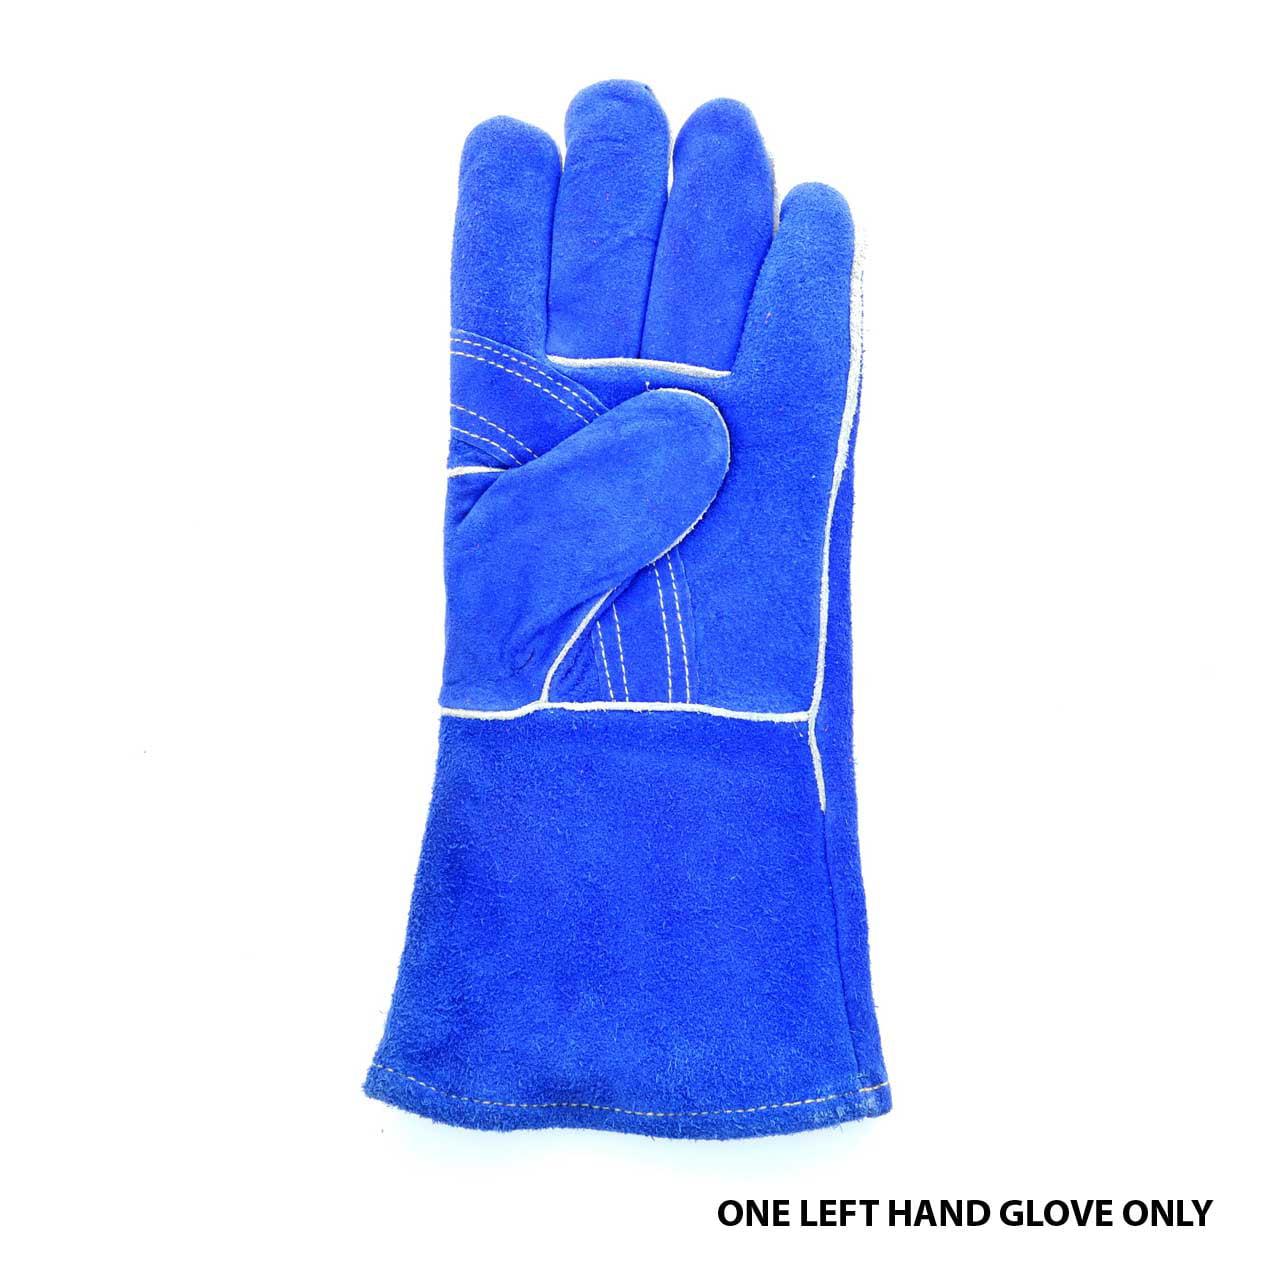 Tillman 1018 Slightly Select Cowhide Welding Gloves, Left Hand Only, Large